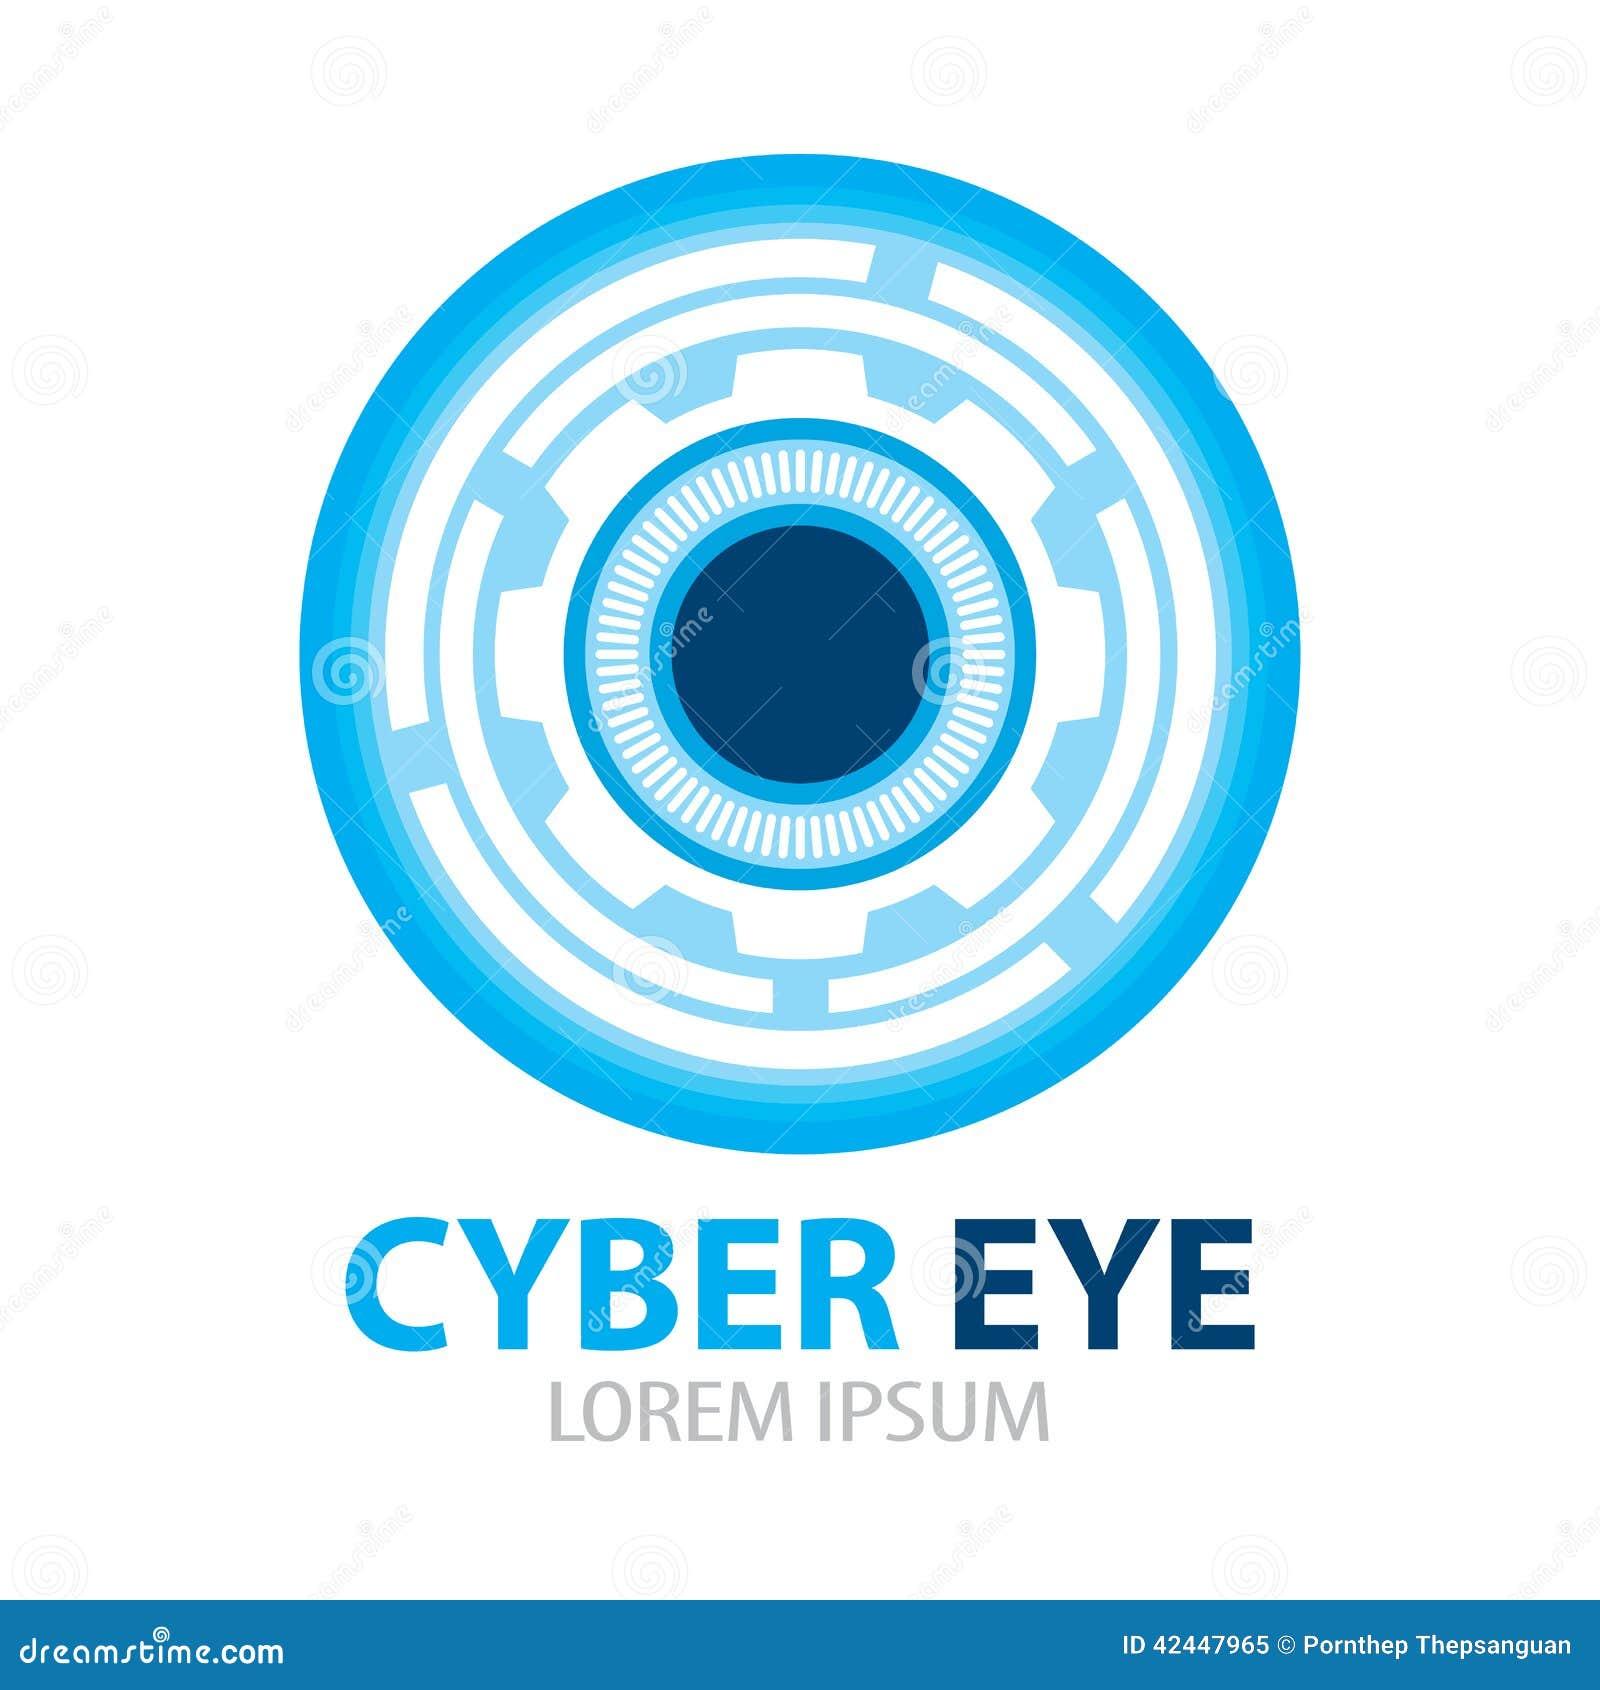 Cyber Eye Symbol Icon Stock Vector Illustration Of Gear 42447965